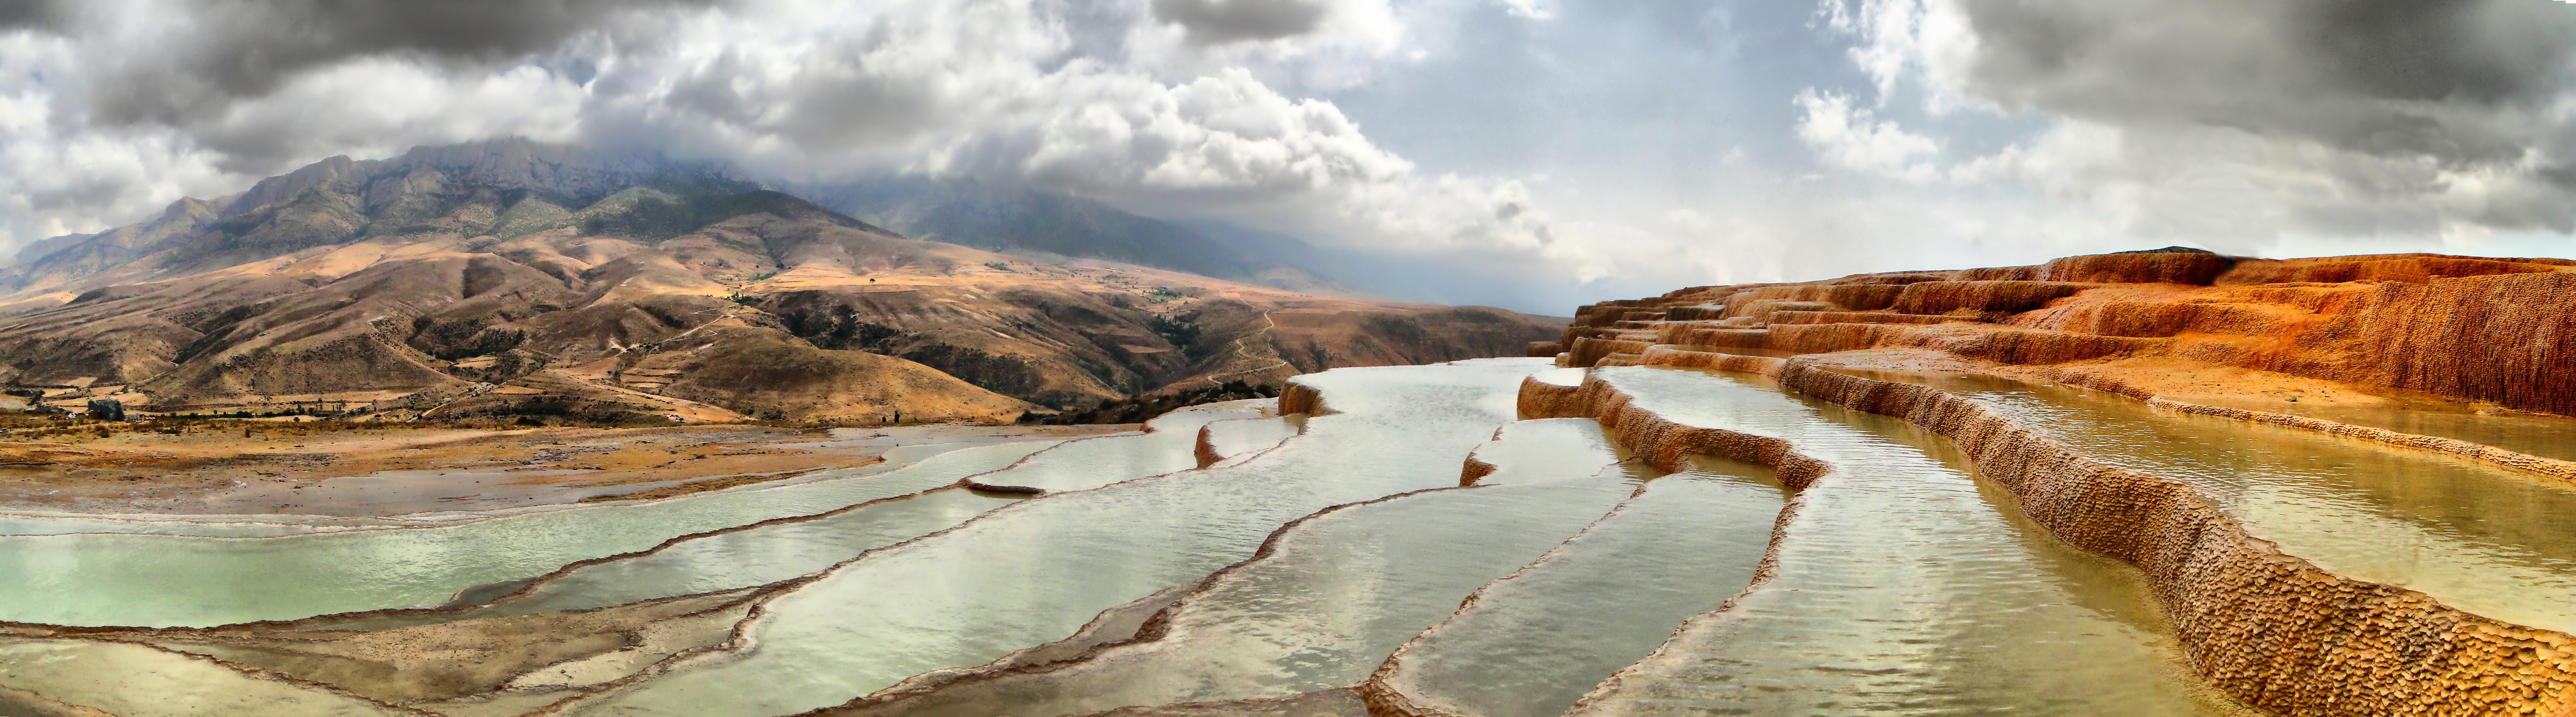 http://upload.wikimedia.org/wikipedia/commons/9/9d/Badab-e_Surt_Panorama.jpg